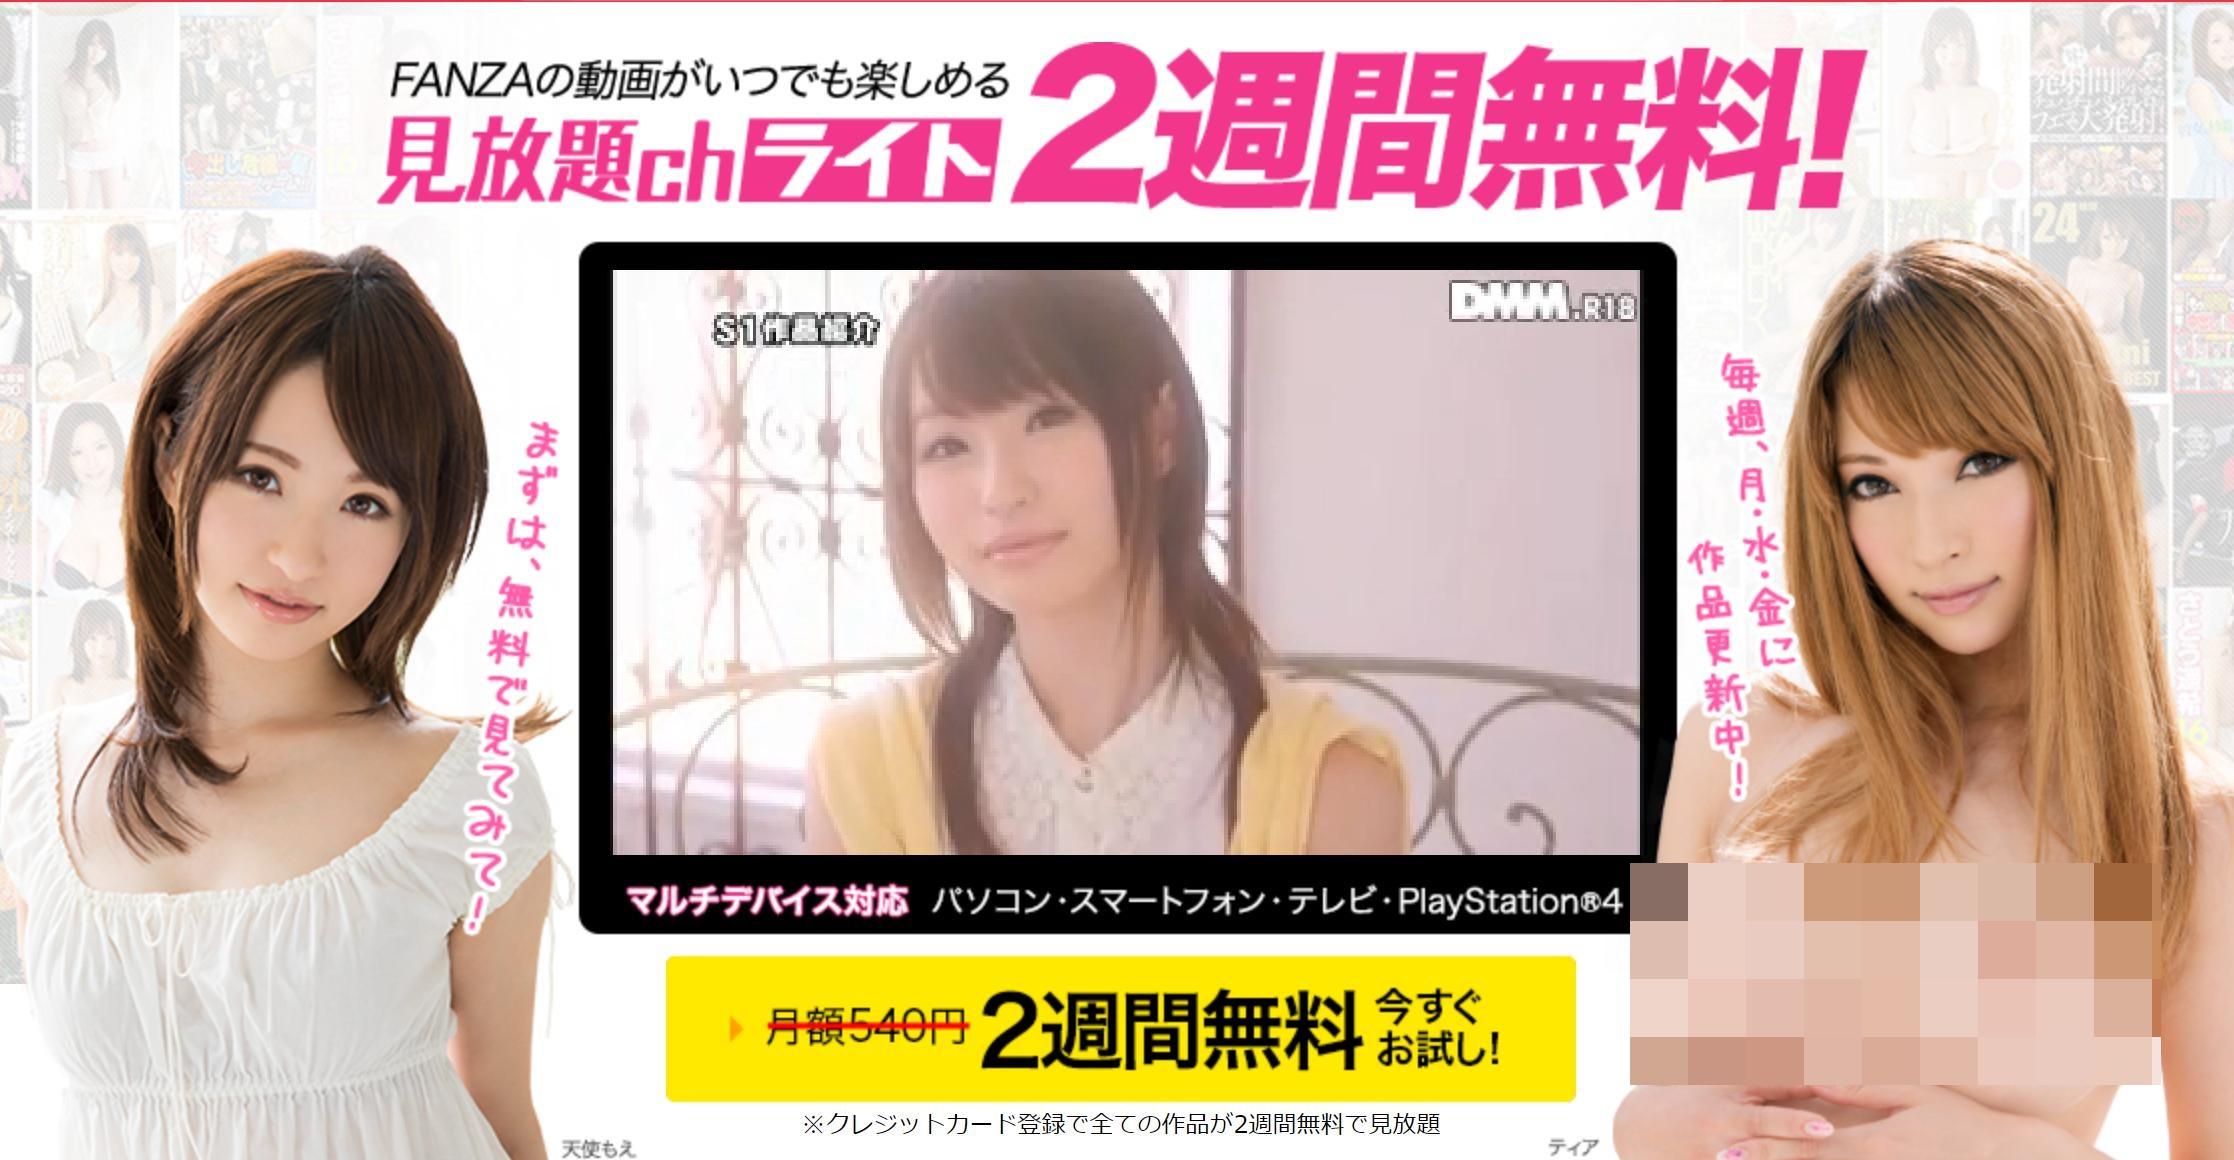 FANZAは500円で見放題!